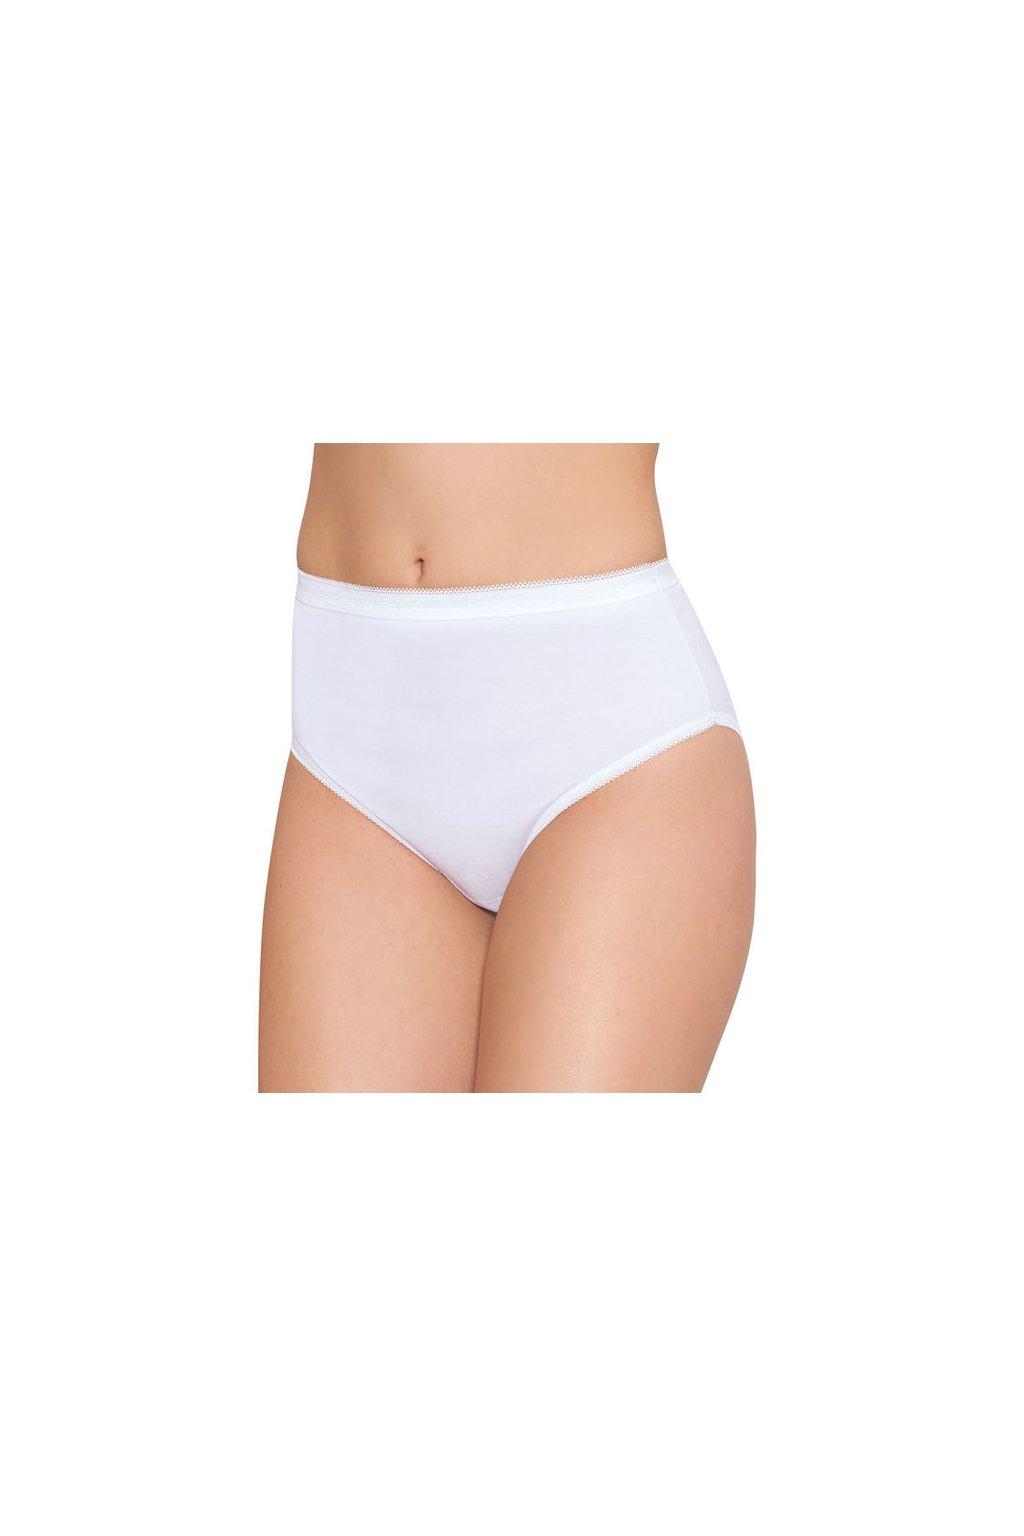 Dámské kalhotky, 100NINA 1, bílá